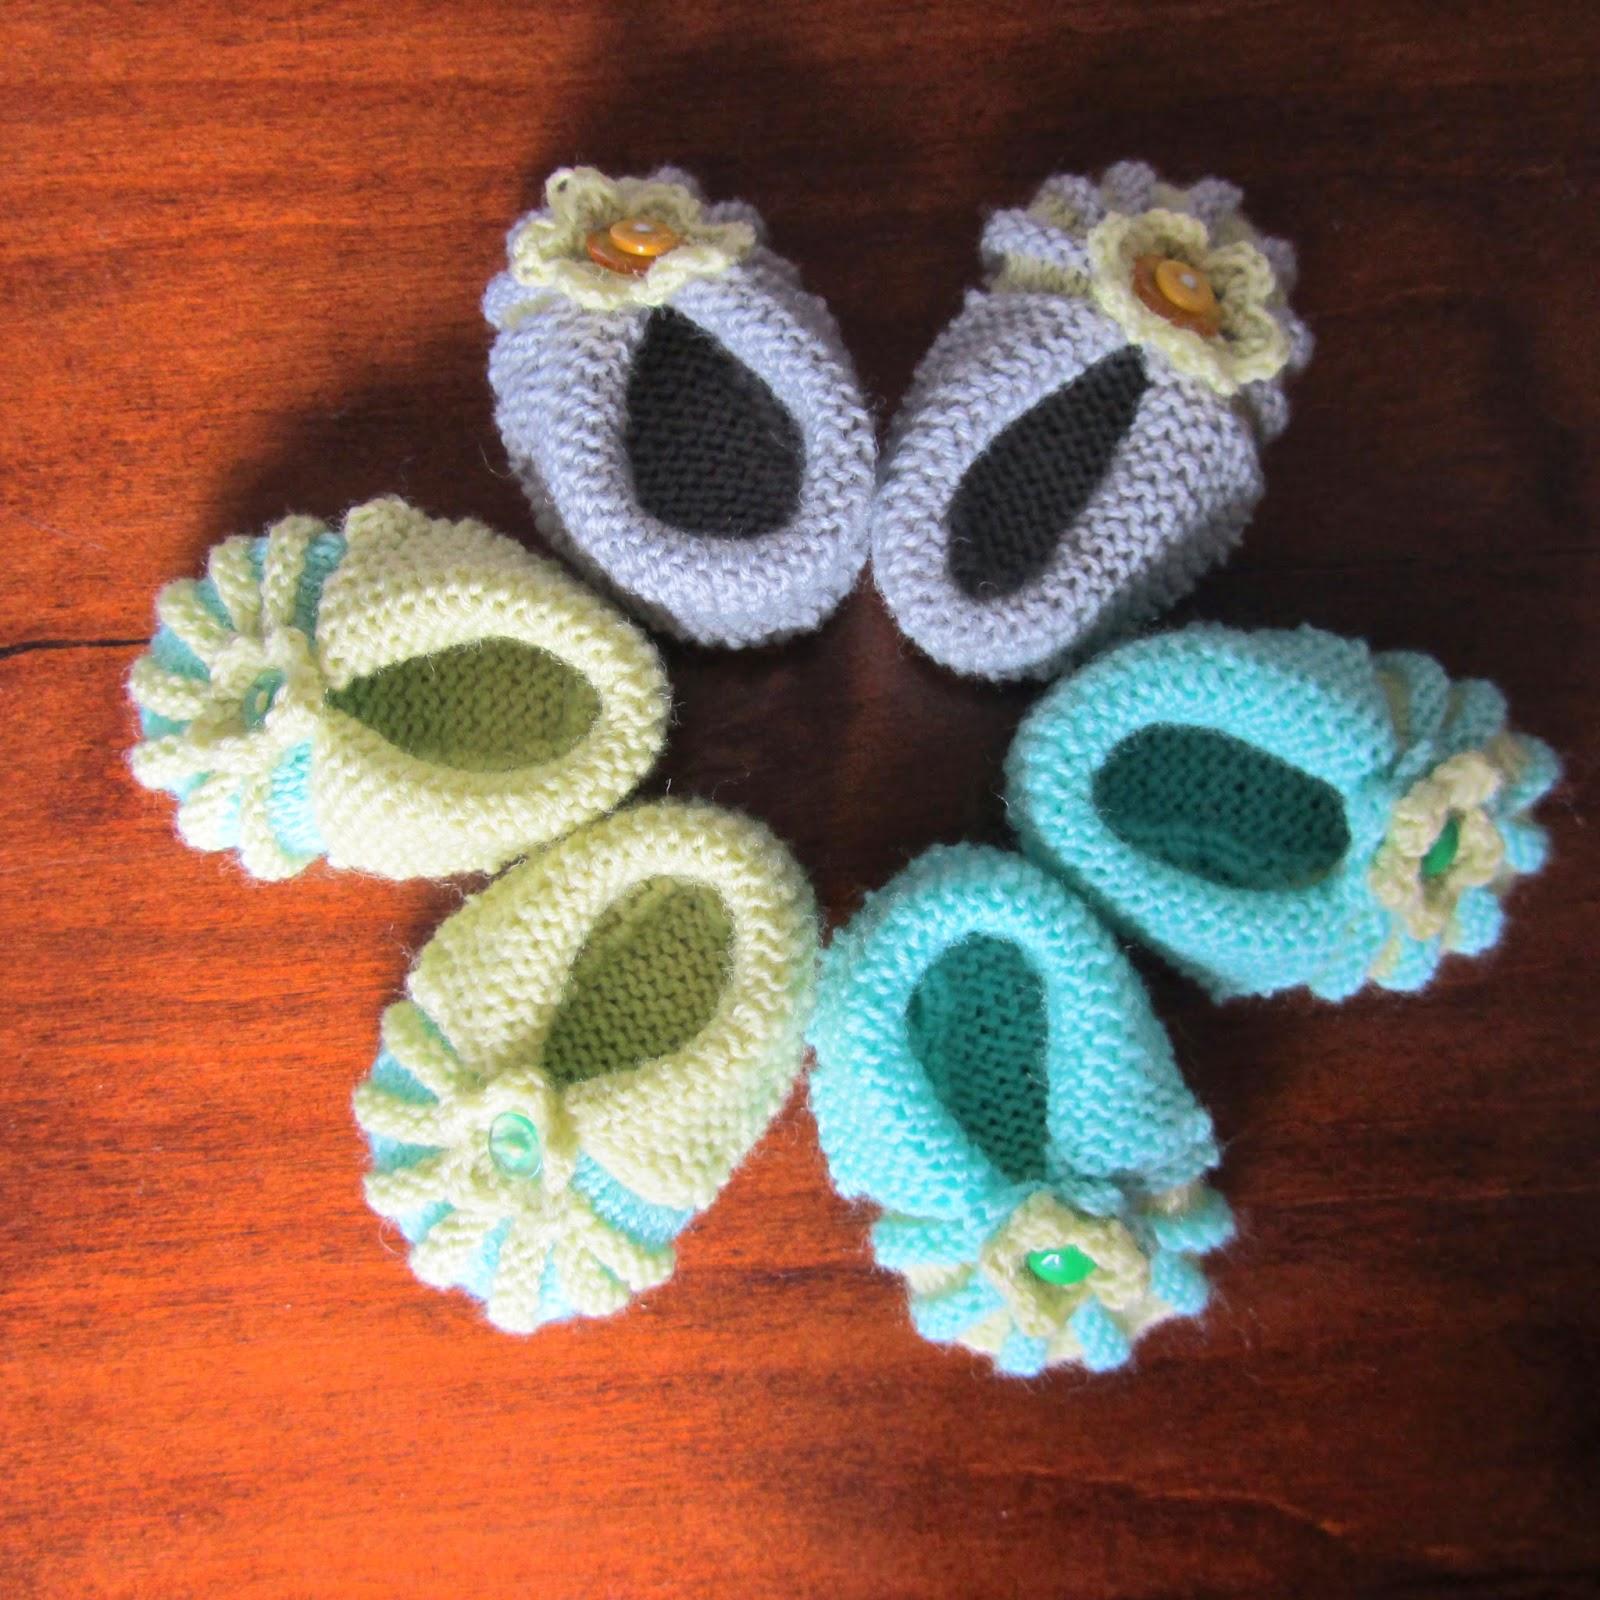 http://garter-stitch.blogspot.fi/2014/04/vauvan-tossut-ohje.html